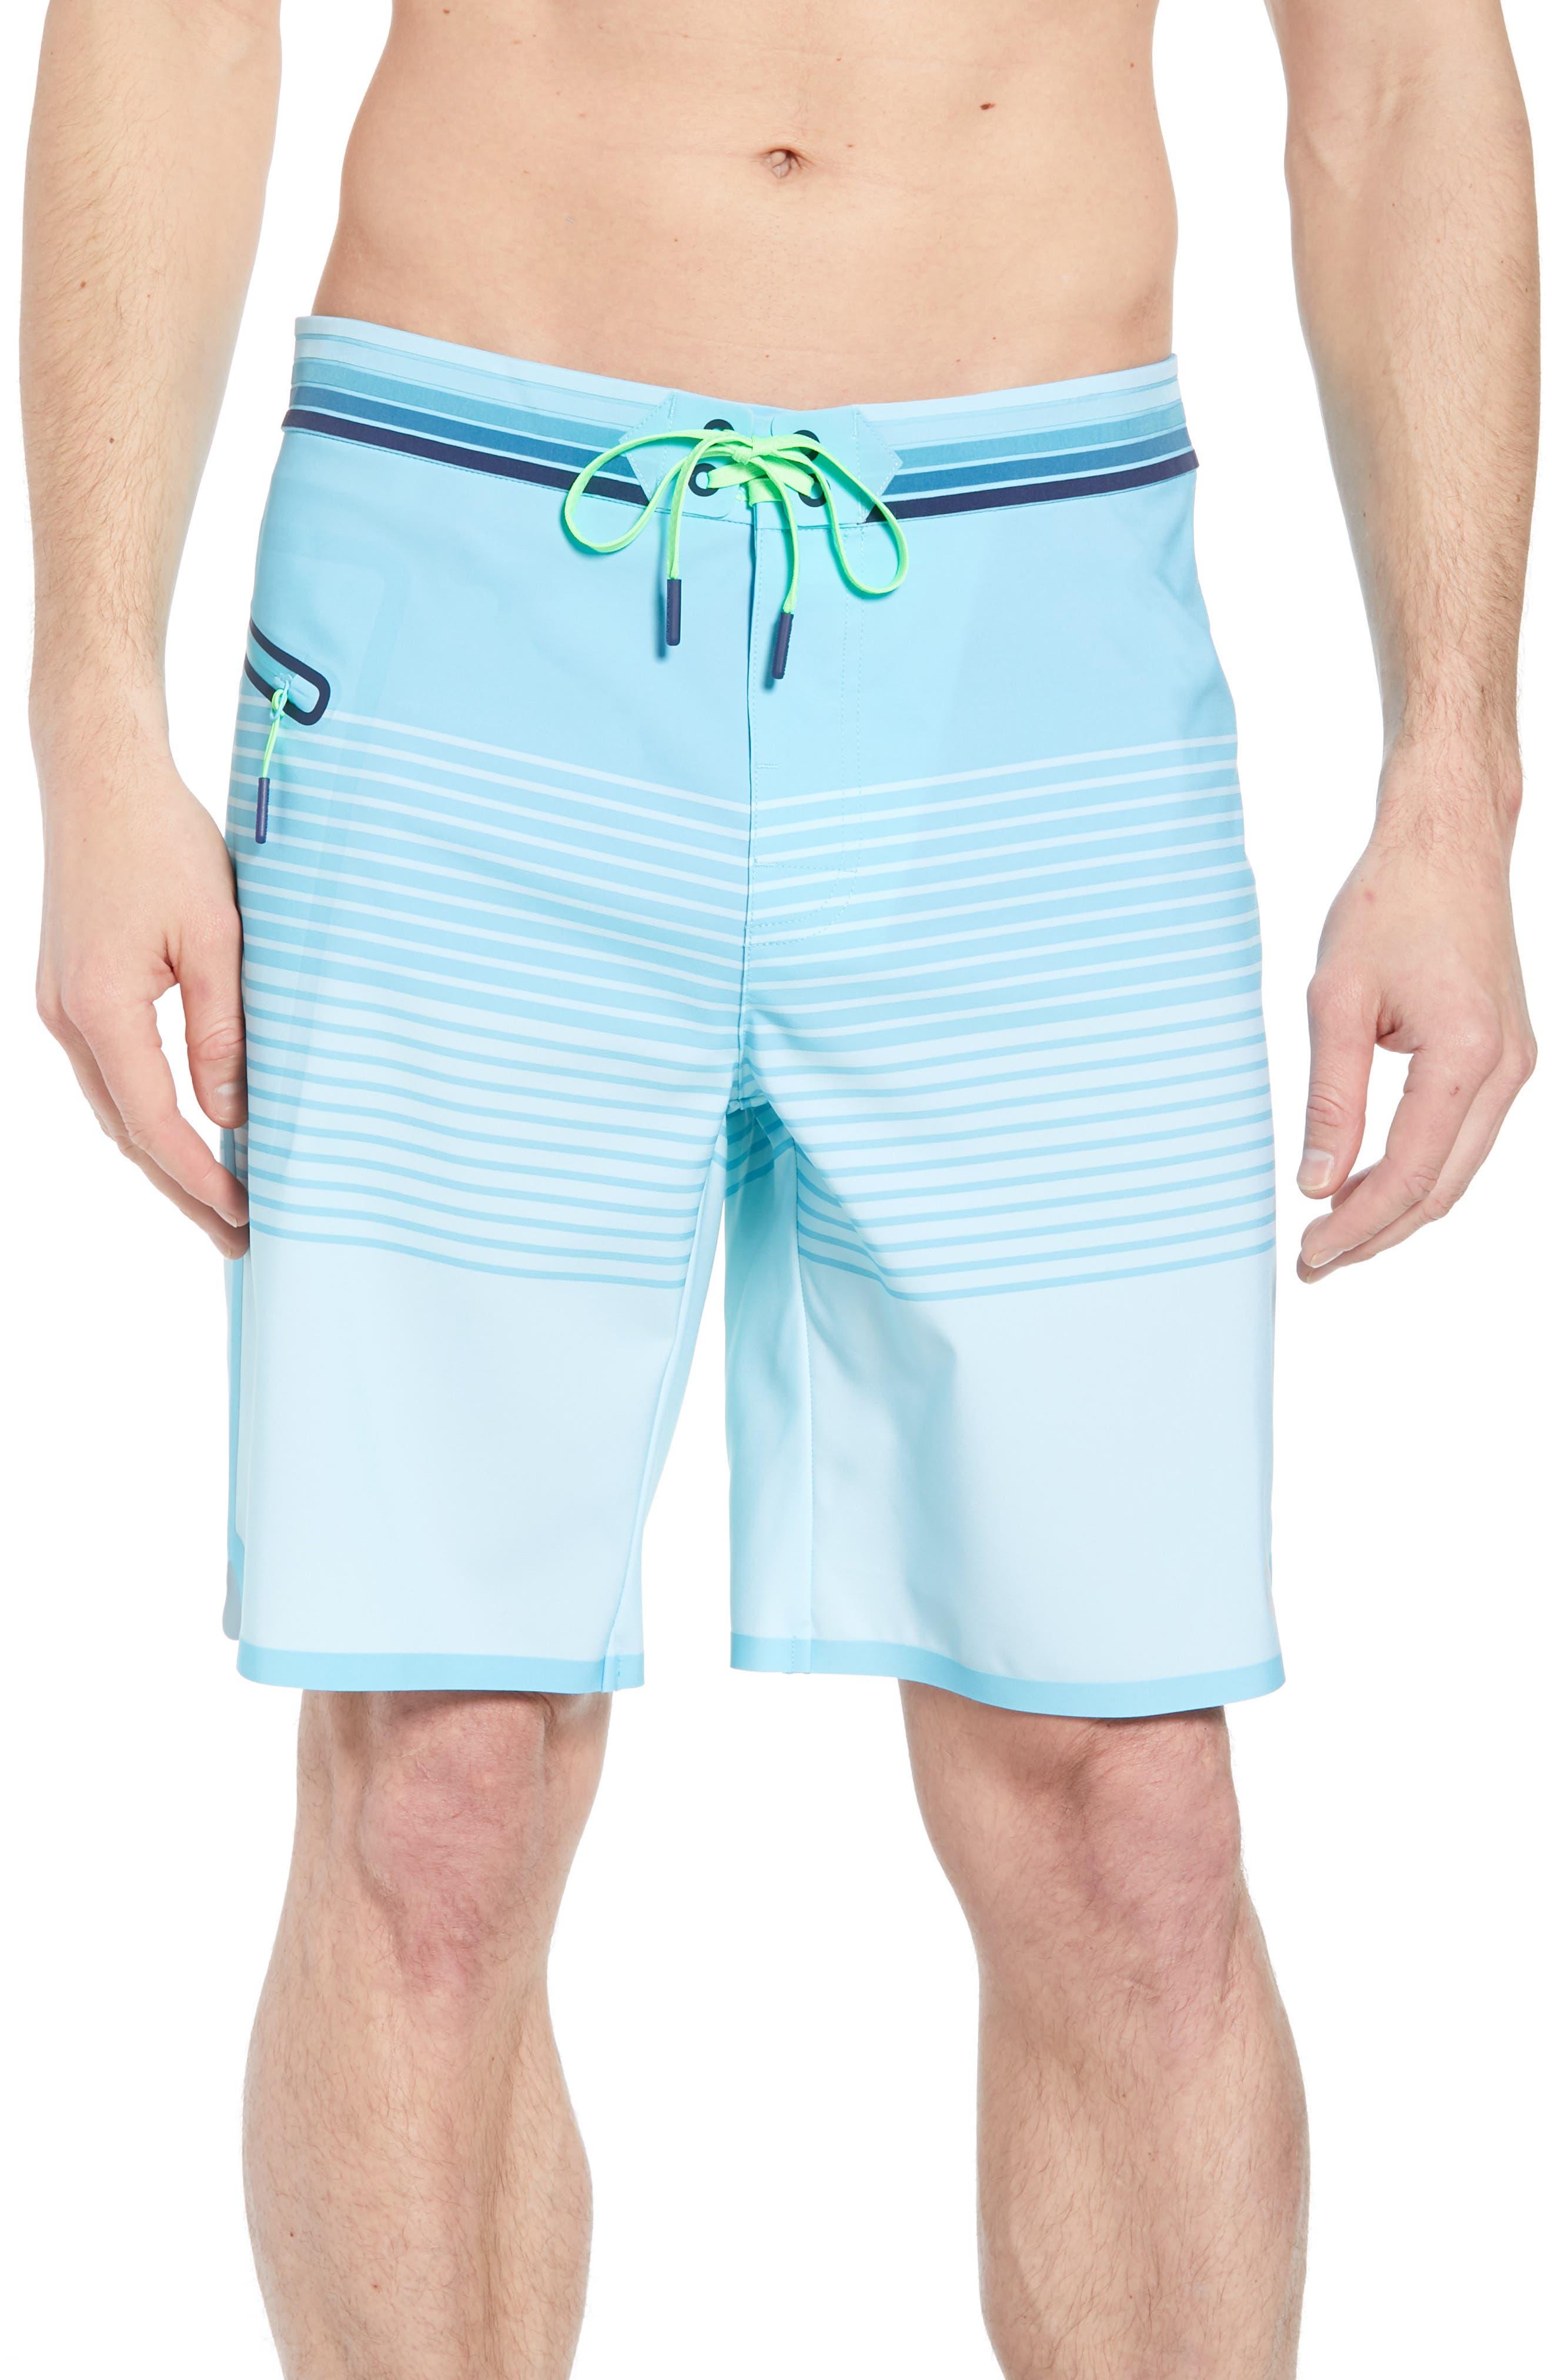 Sculplin Stripe Tech Board Shorts,                             Main thumbnail 1, color,                             Turquoise